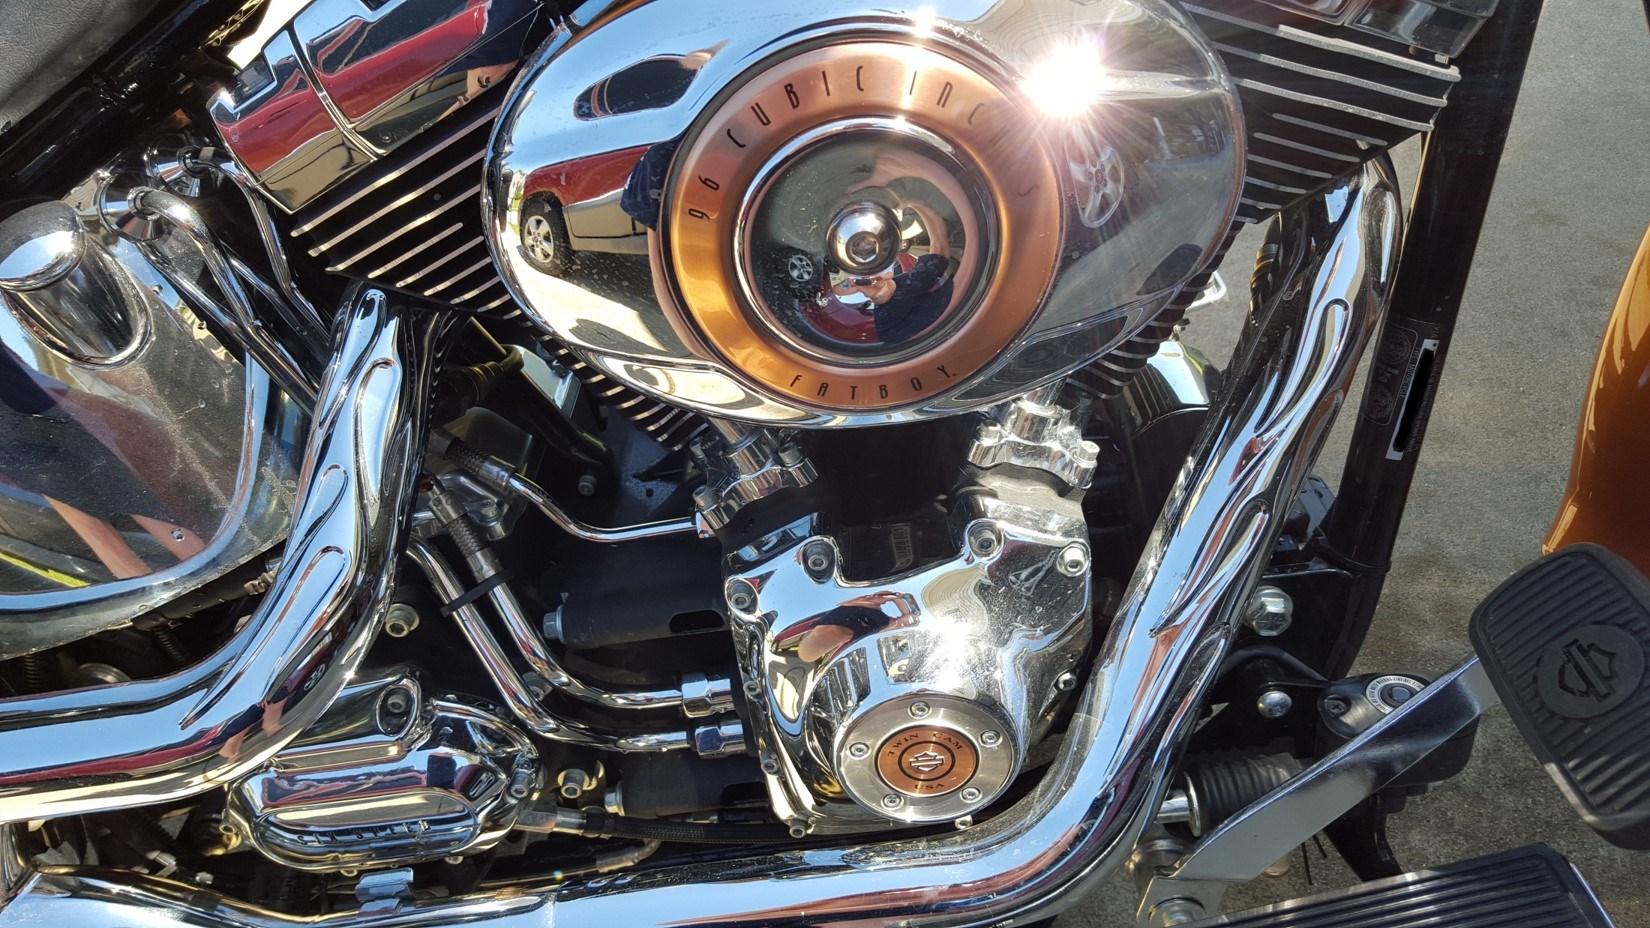 2008 Harley Davidson 174 Flstf Anv Softail 174 Fat Boy